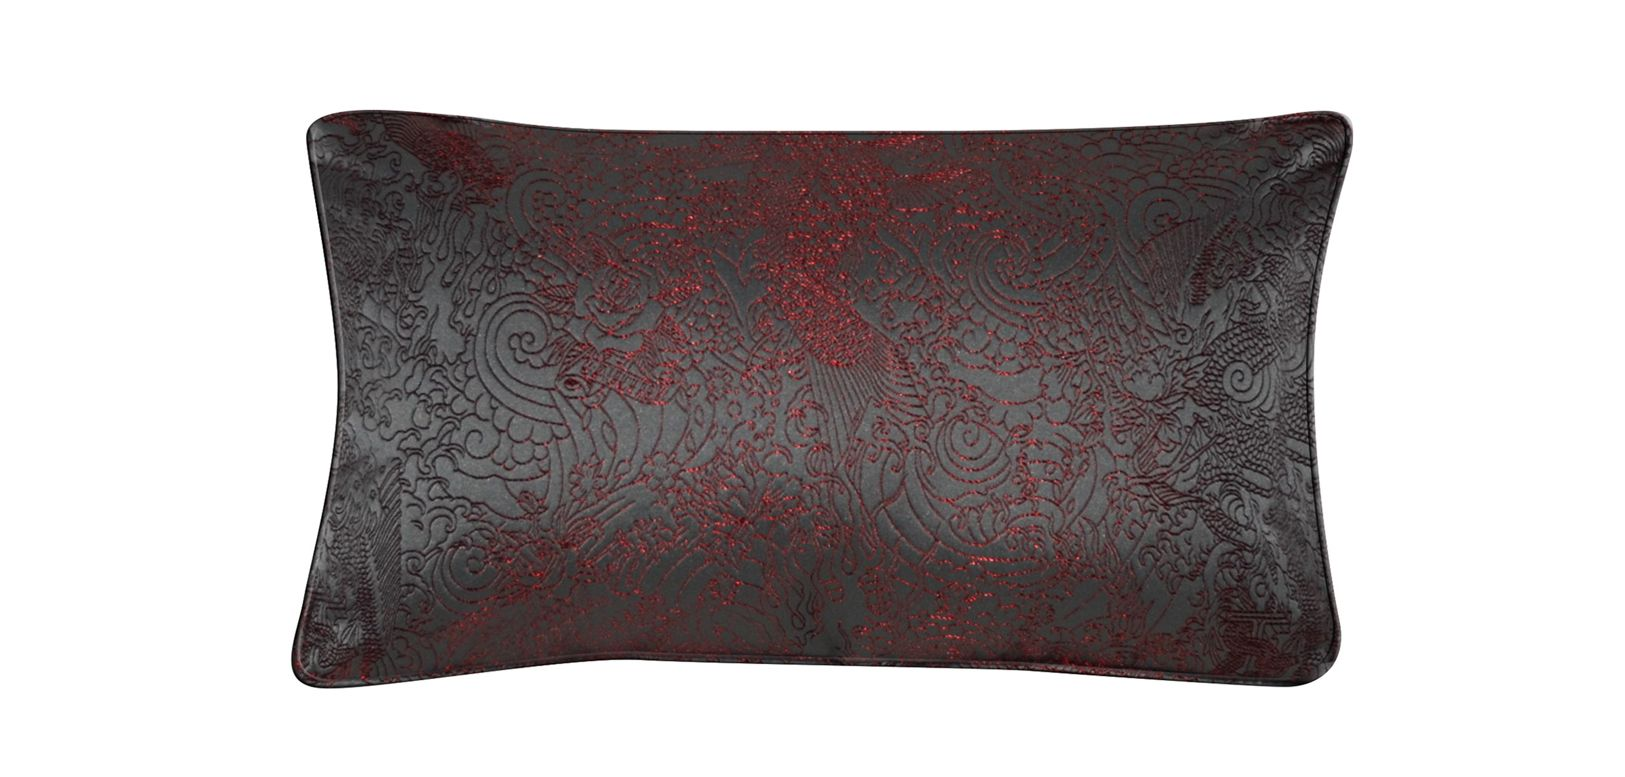 Coussin gravure jean paul gaultier roche bobois - Creer son coussin ...